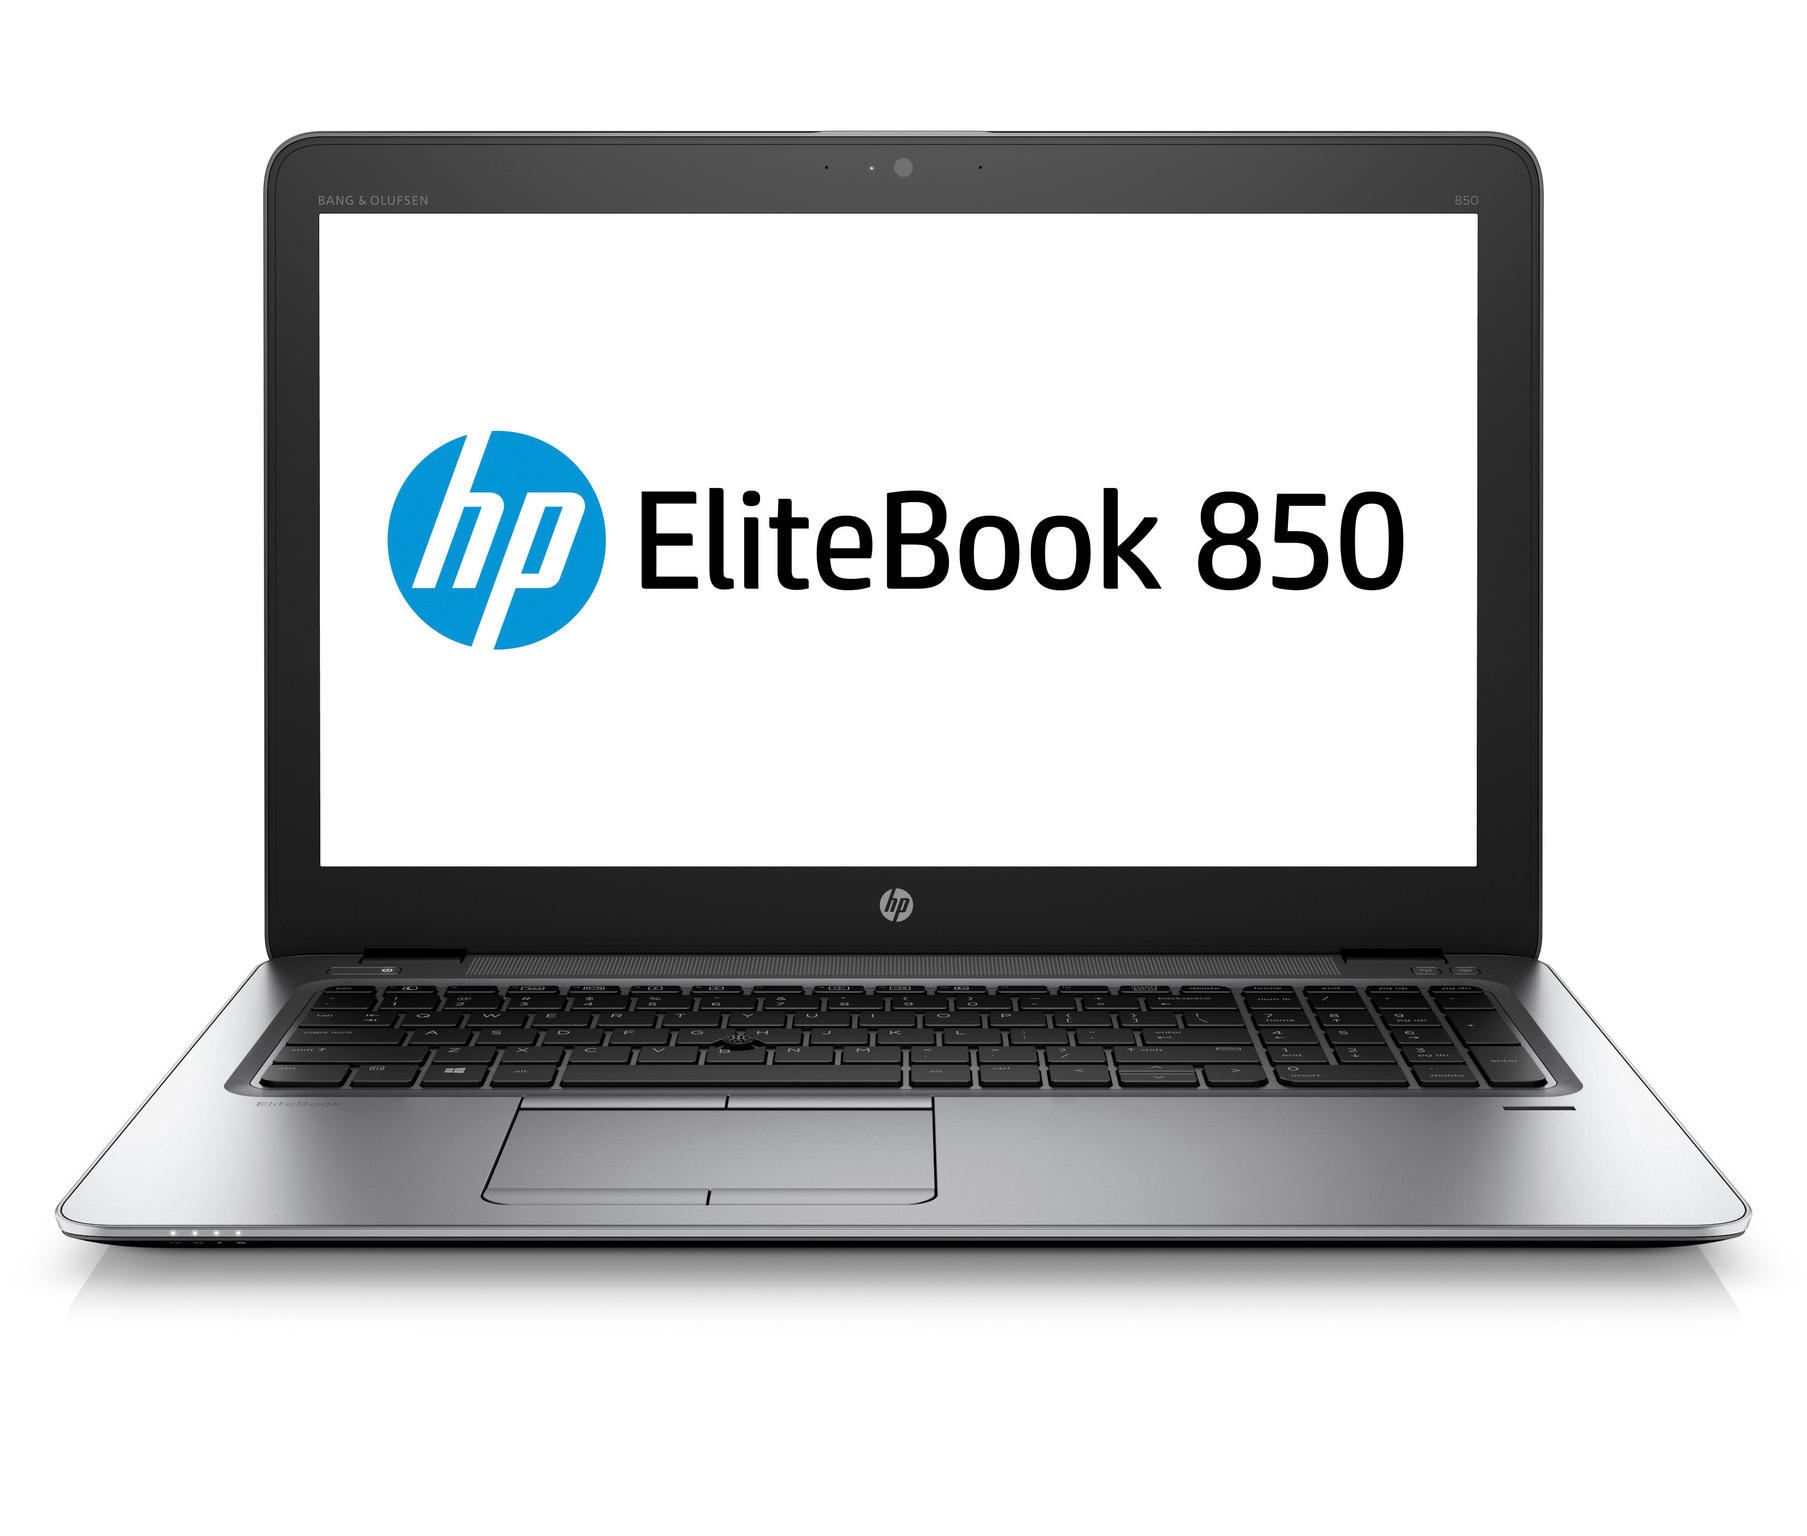 HP Elitebook 850 G4 Z2W89EA AZERTY